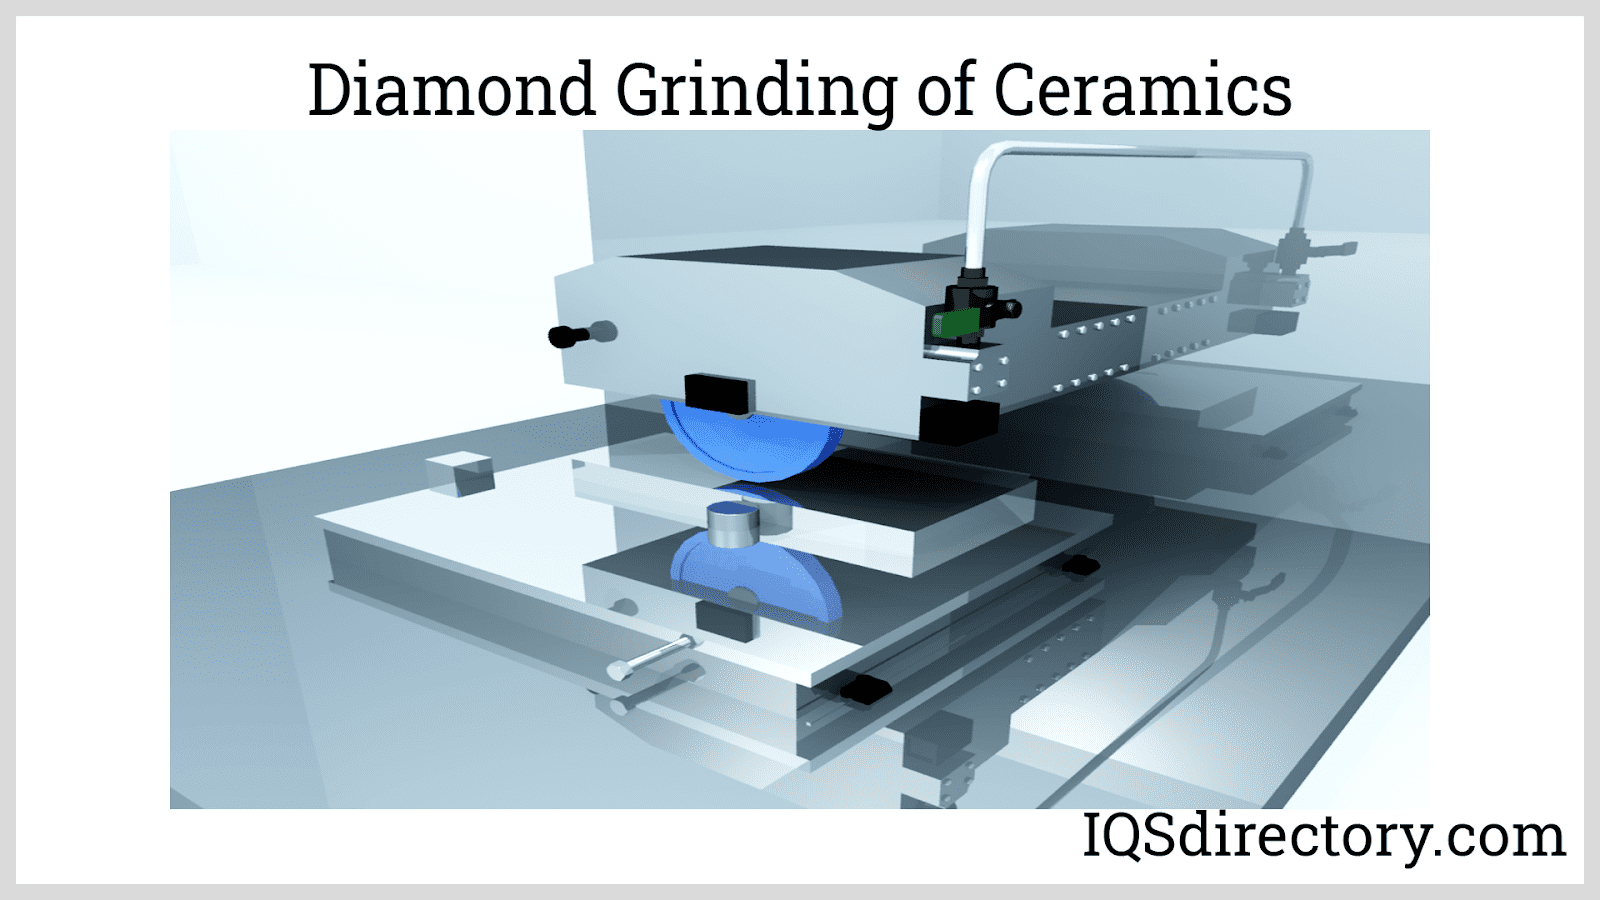 Diamond Grinding of Ceramics